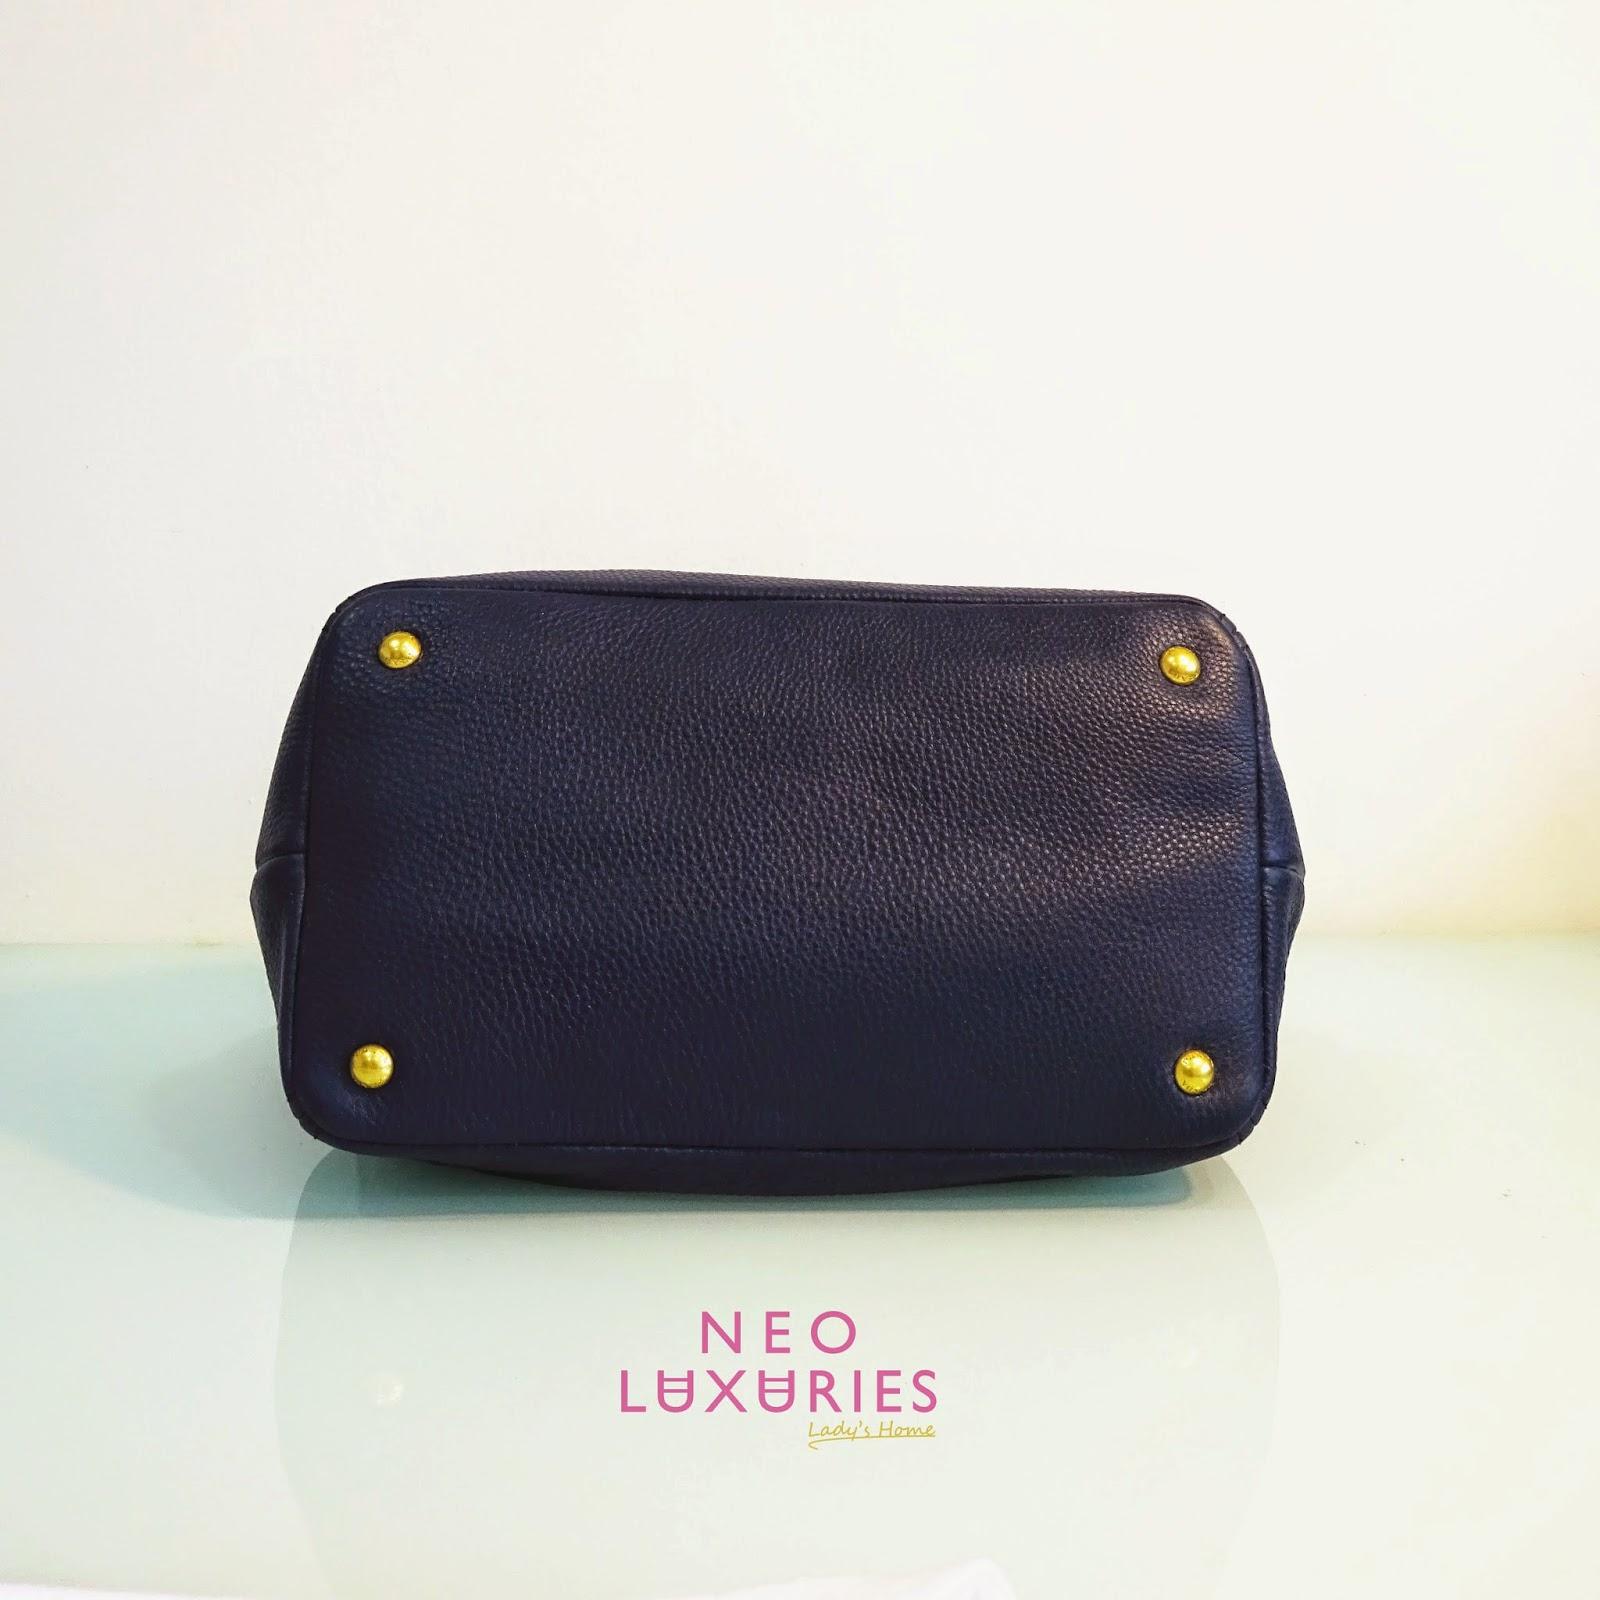 leather prada - Neo LUXuries: SOLD: PRADA Vitello Daino Calf Leather Bag - BN2534